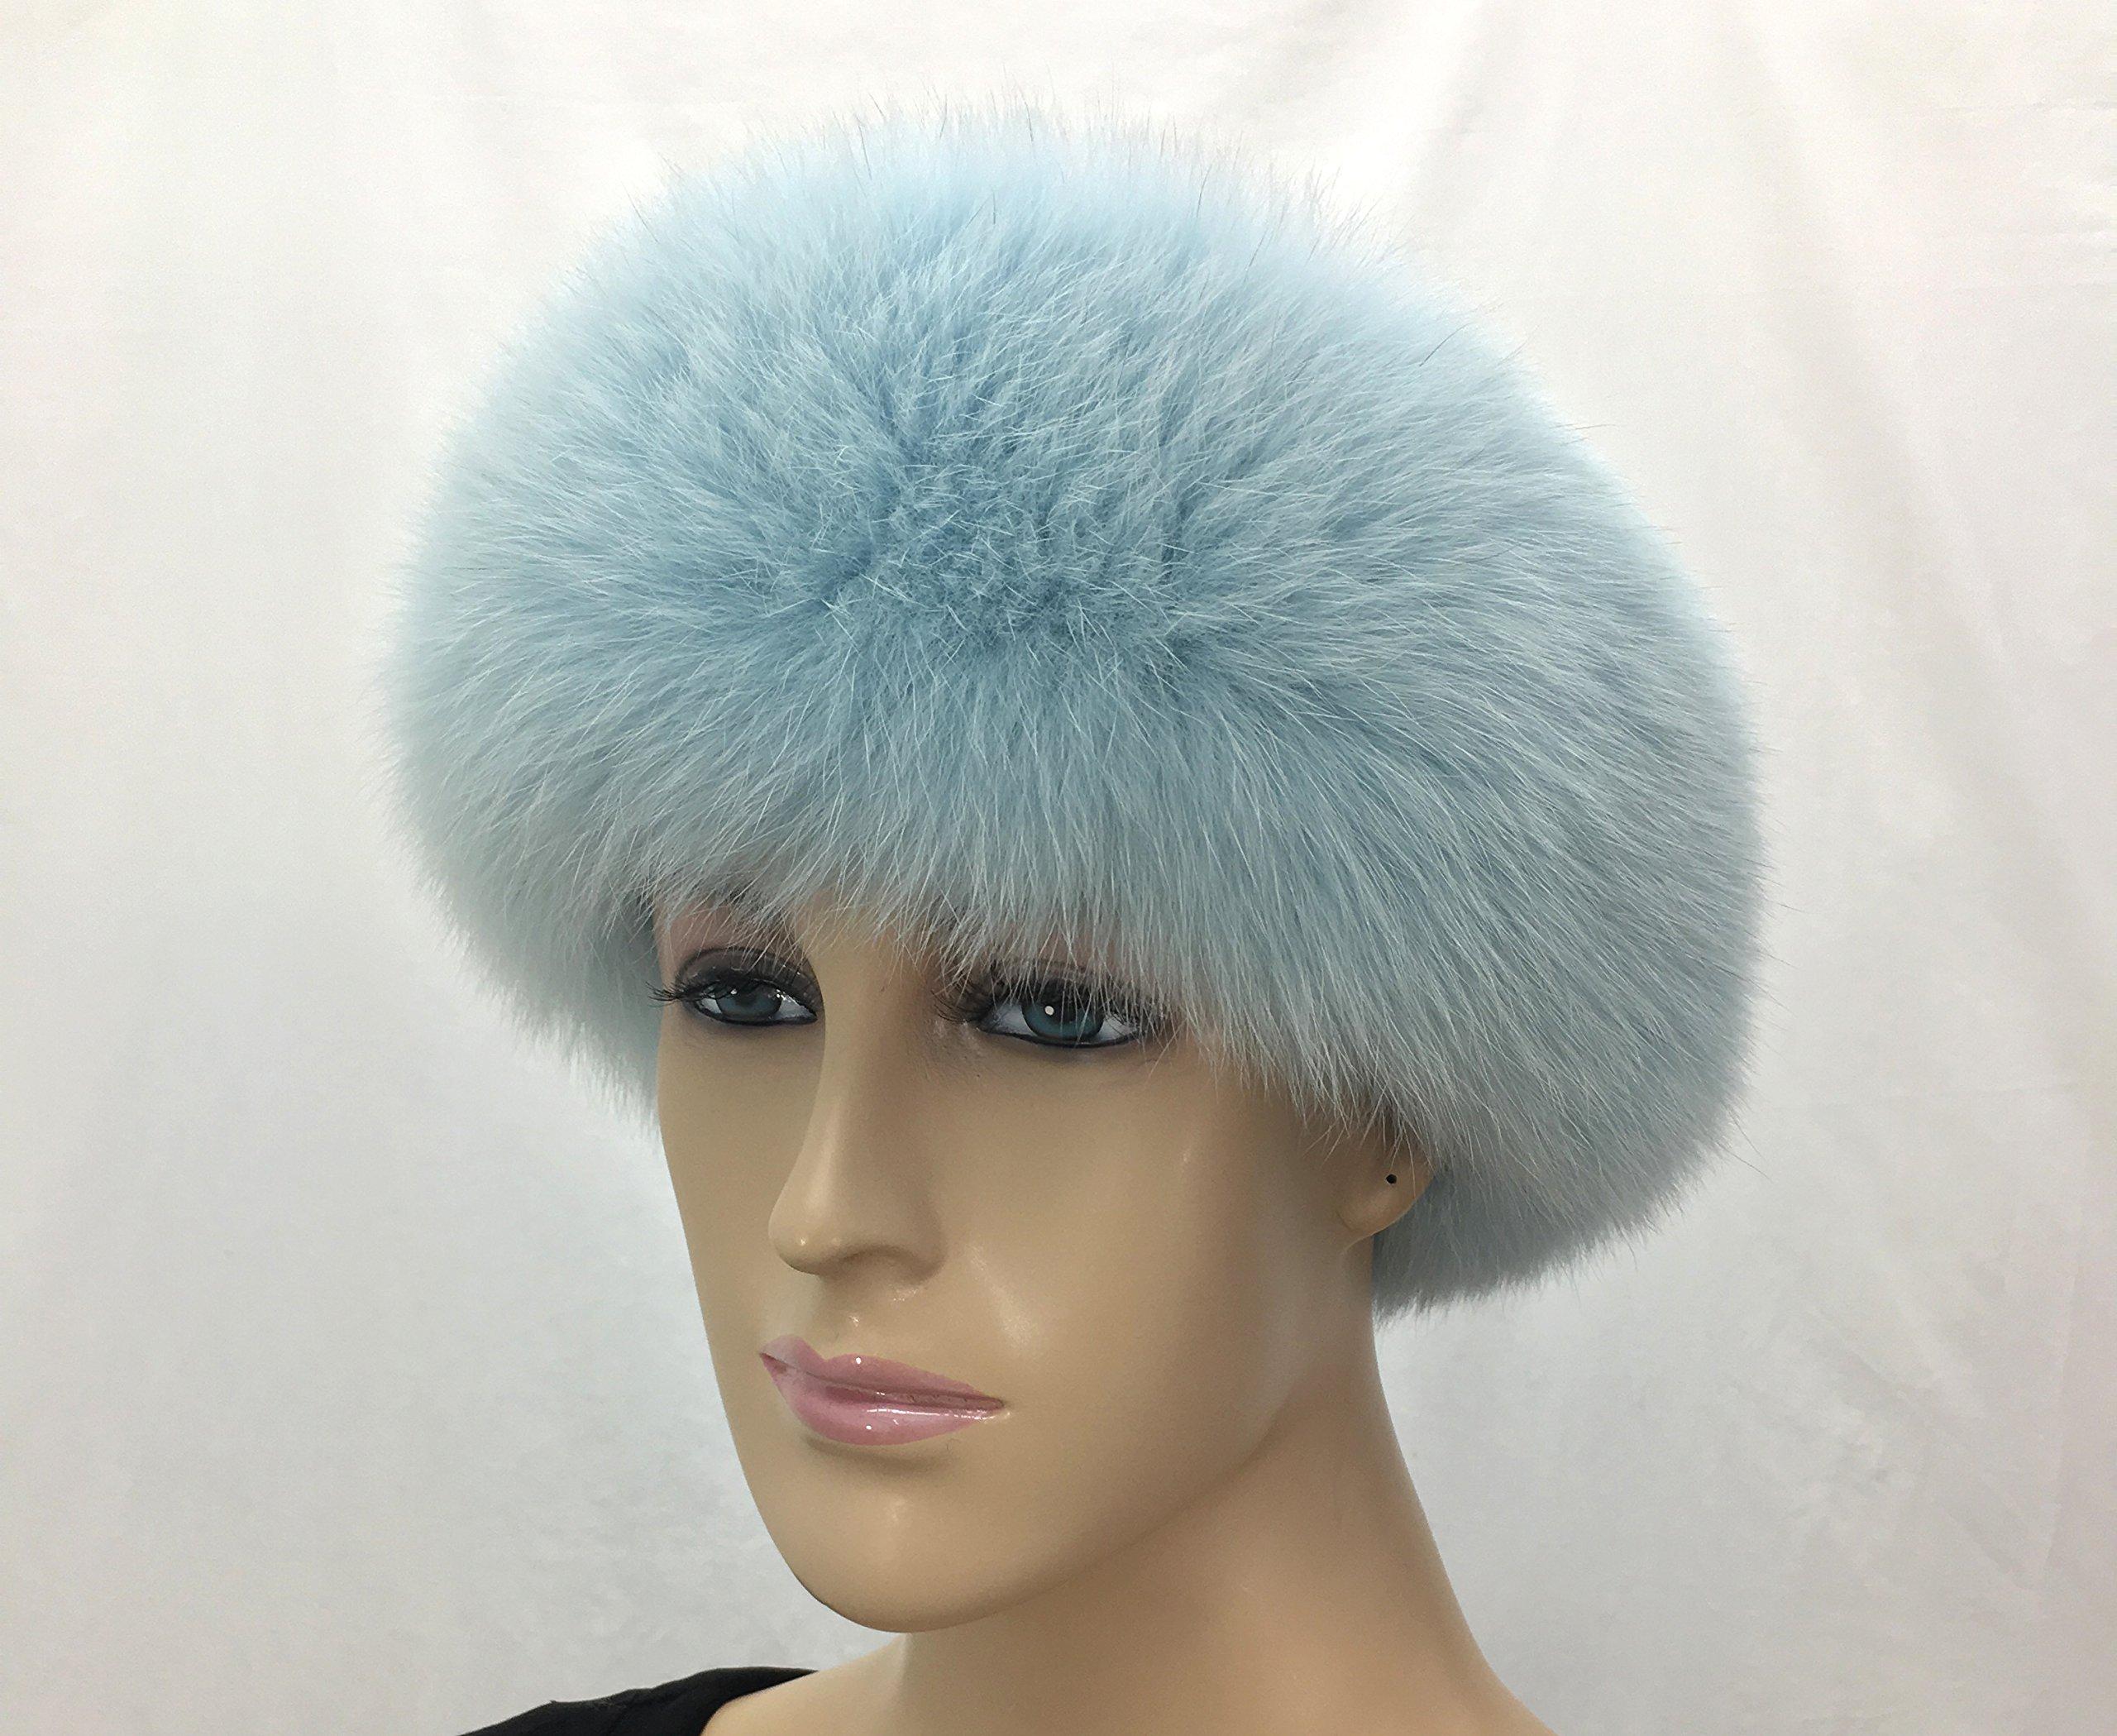 HIMA 100% Real Fox Fur Headband (Light Blue) by Hima (Image #2)